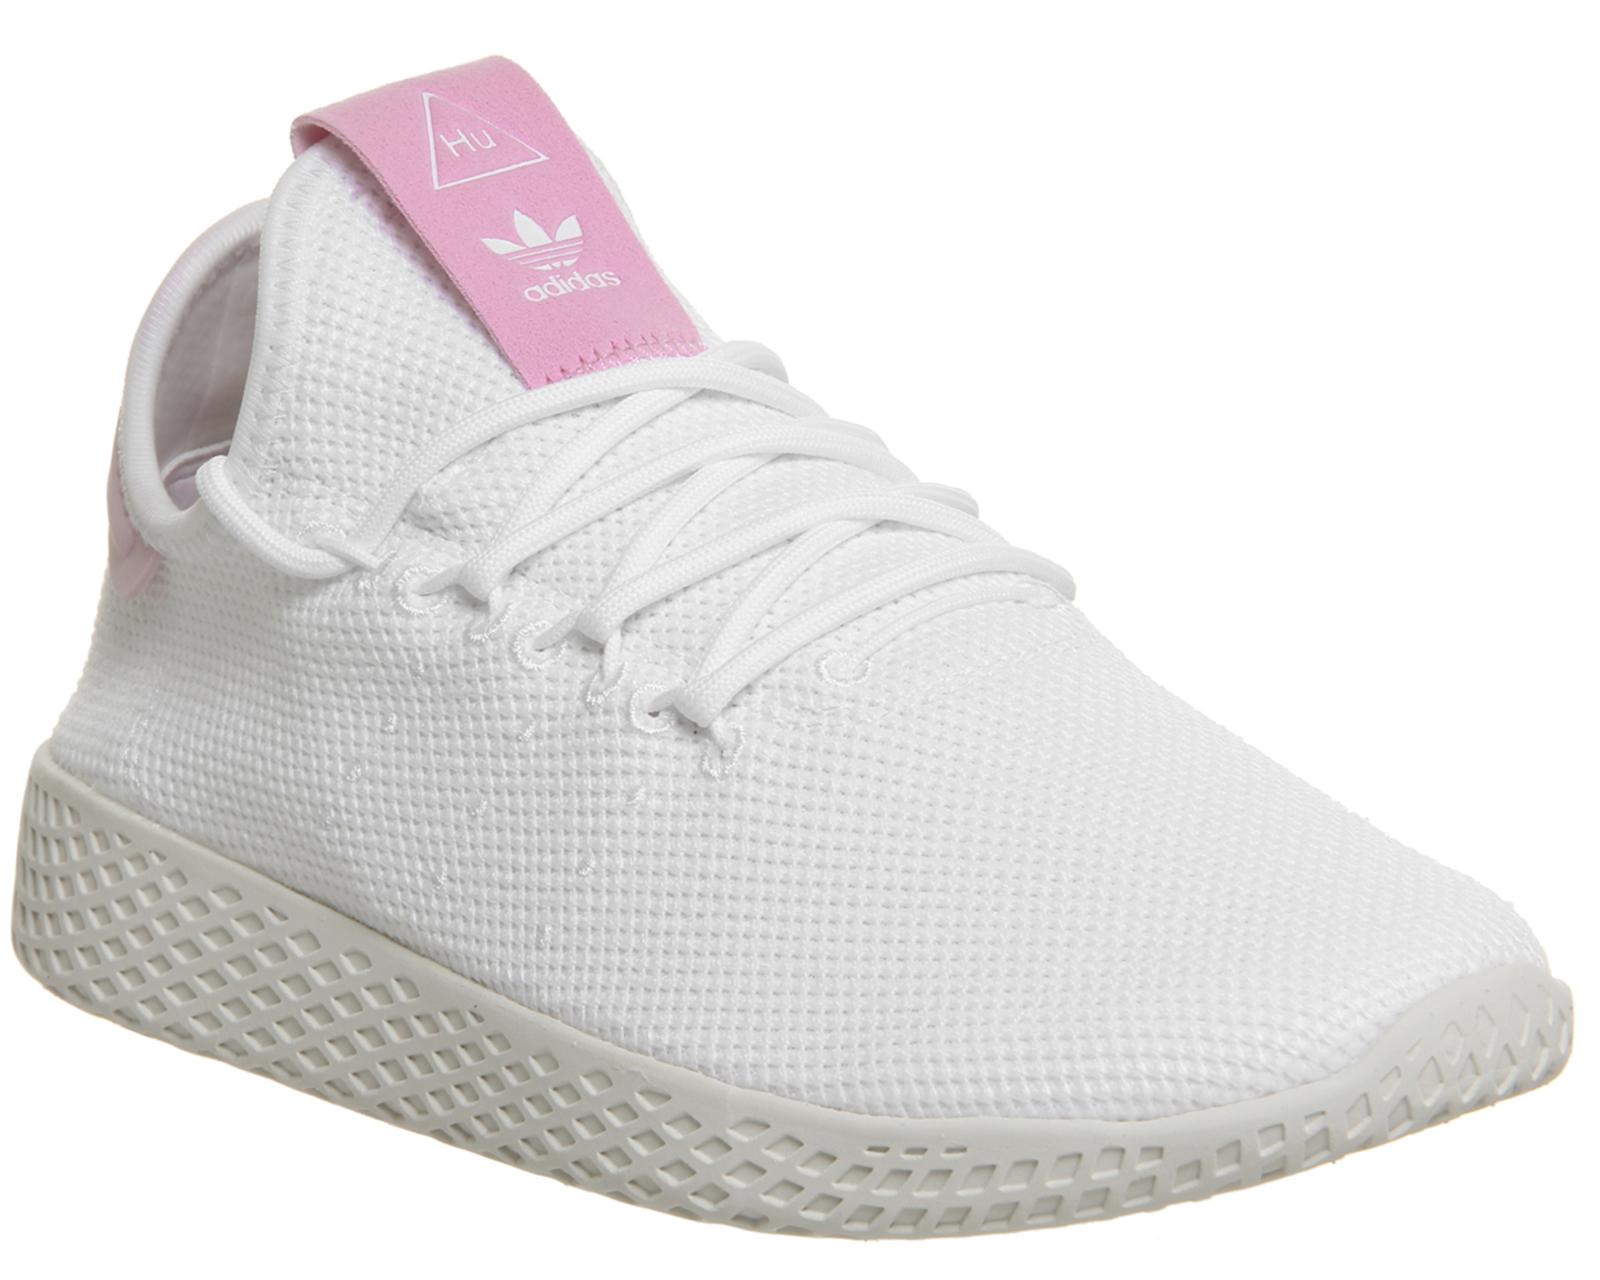 fc80cd9ca Sentinel Womens Adidas Pw Tennis Hu White White Pink F Trainers Shoes